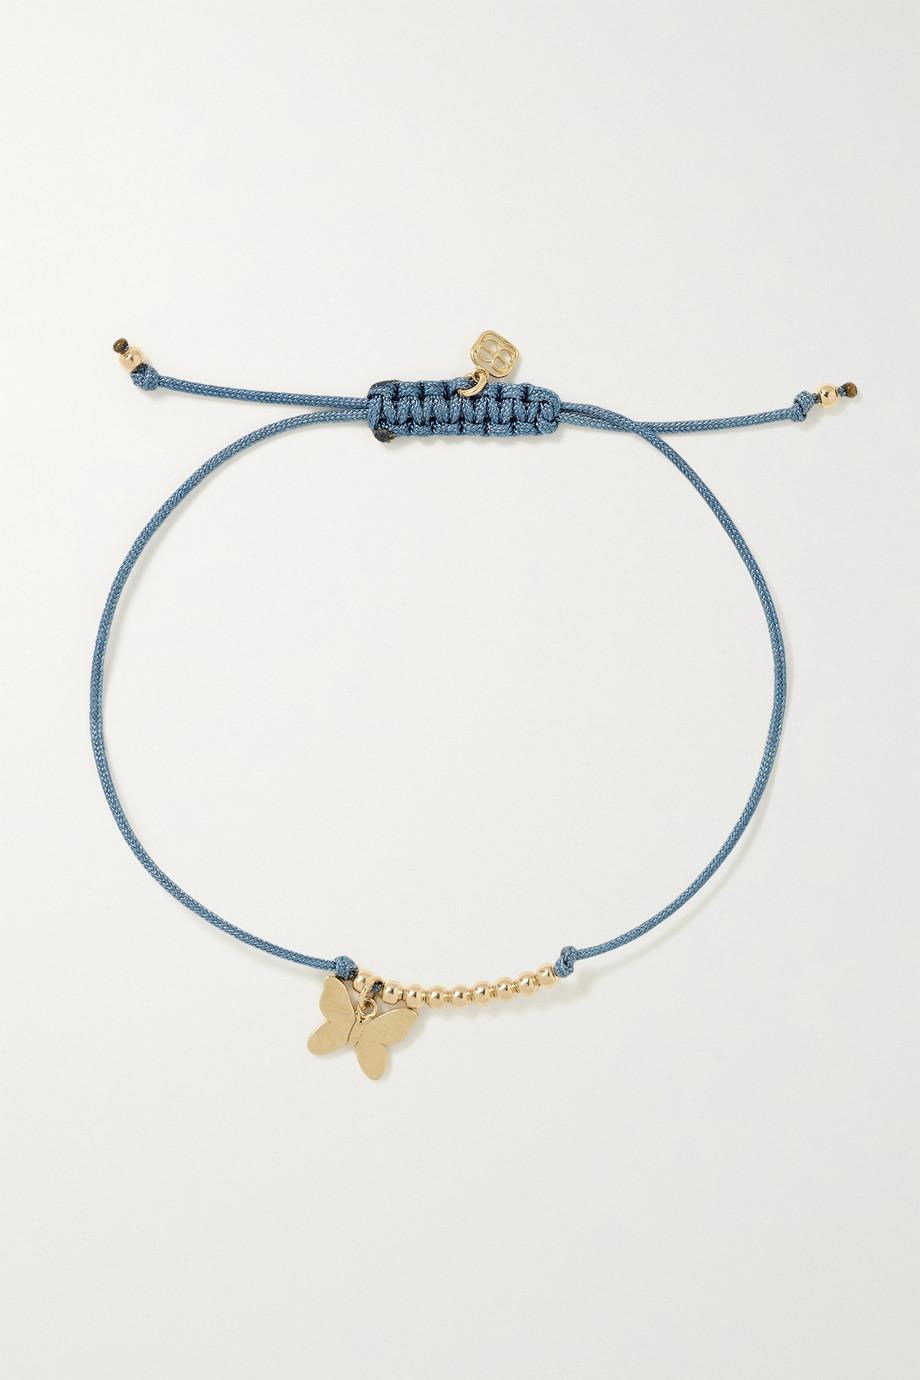 Sydney Evan Bracelet en or 14 carats (585/1000) et corde Butterfly